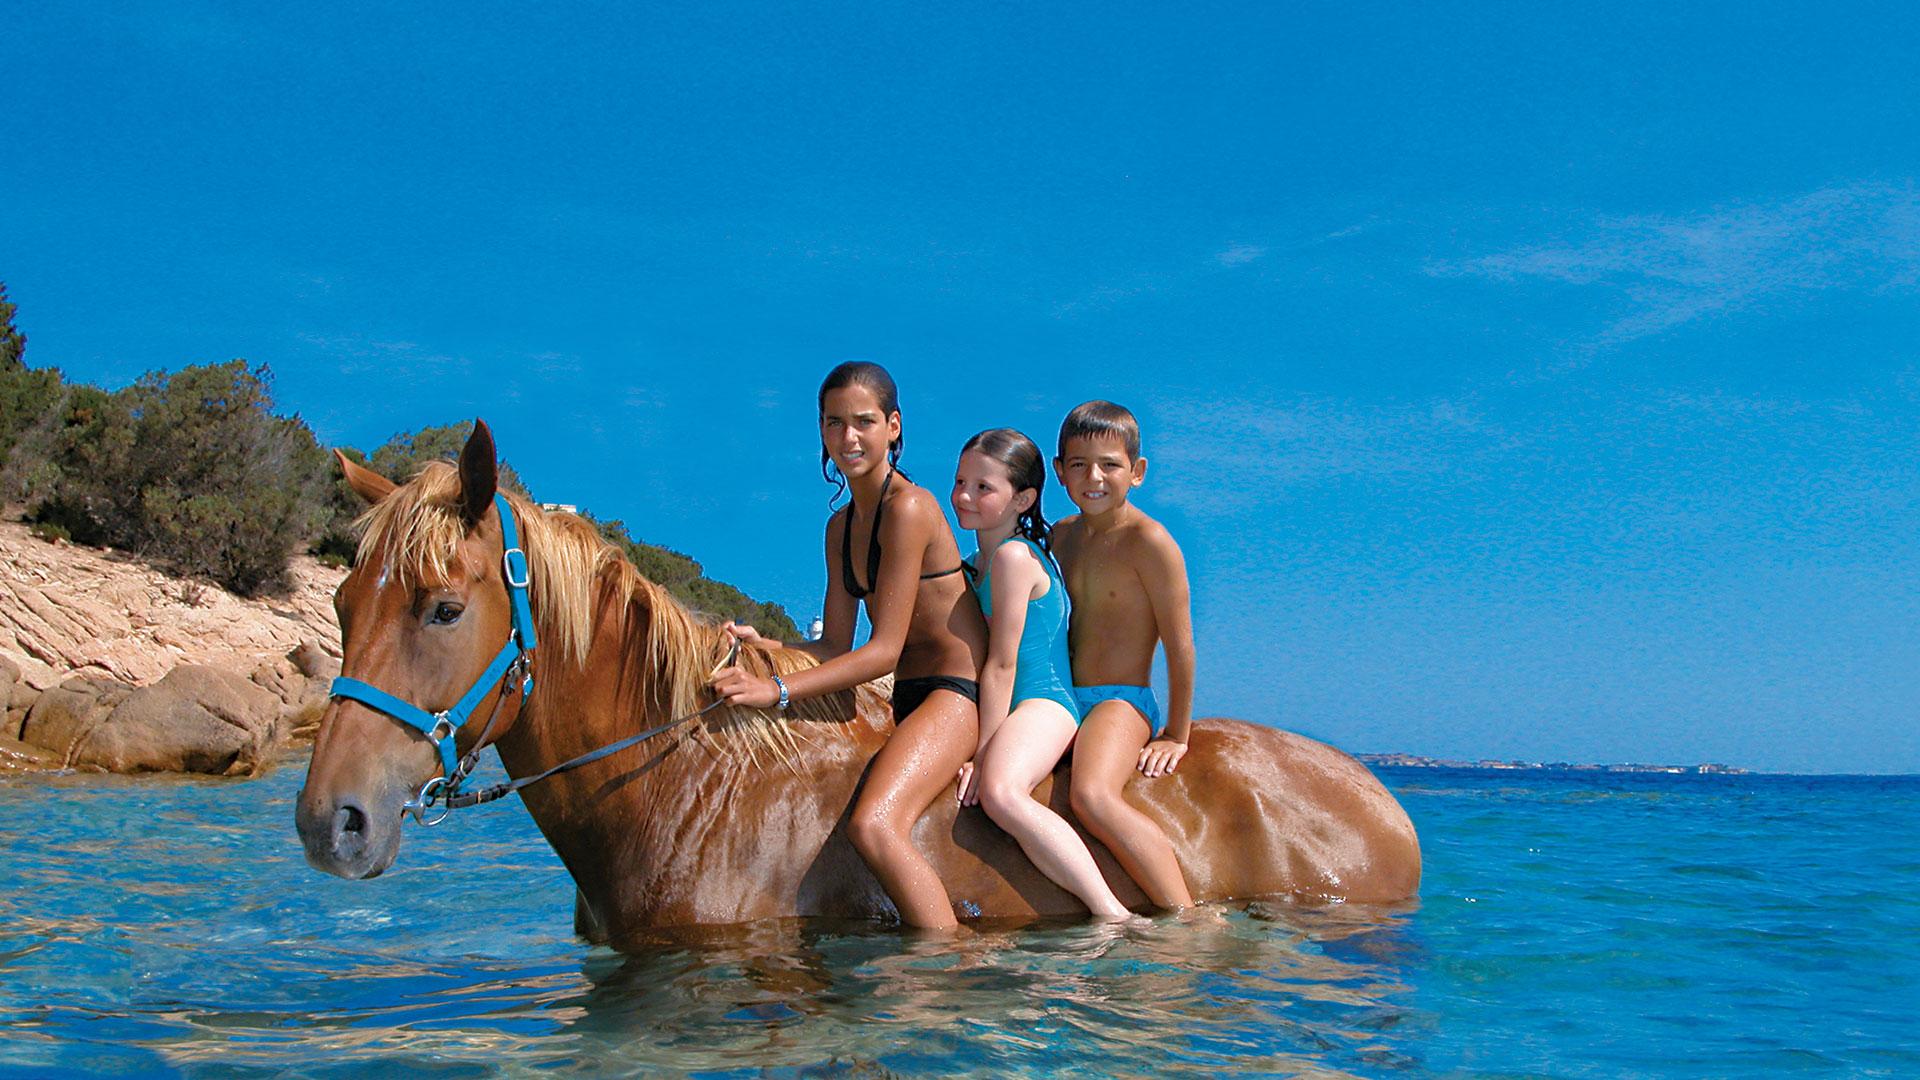 delphina-hotels-slide-5-stelle-in-liberta-bimbi-mare-sardegna